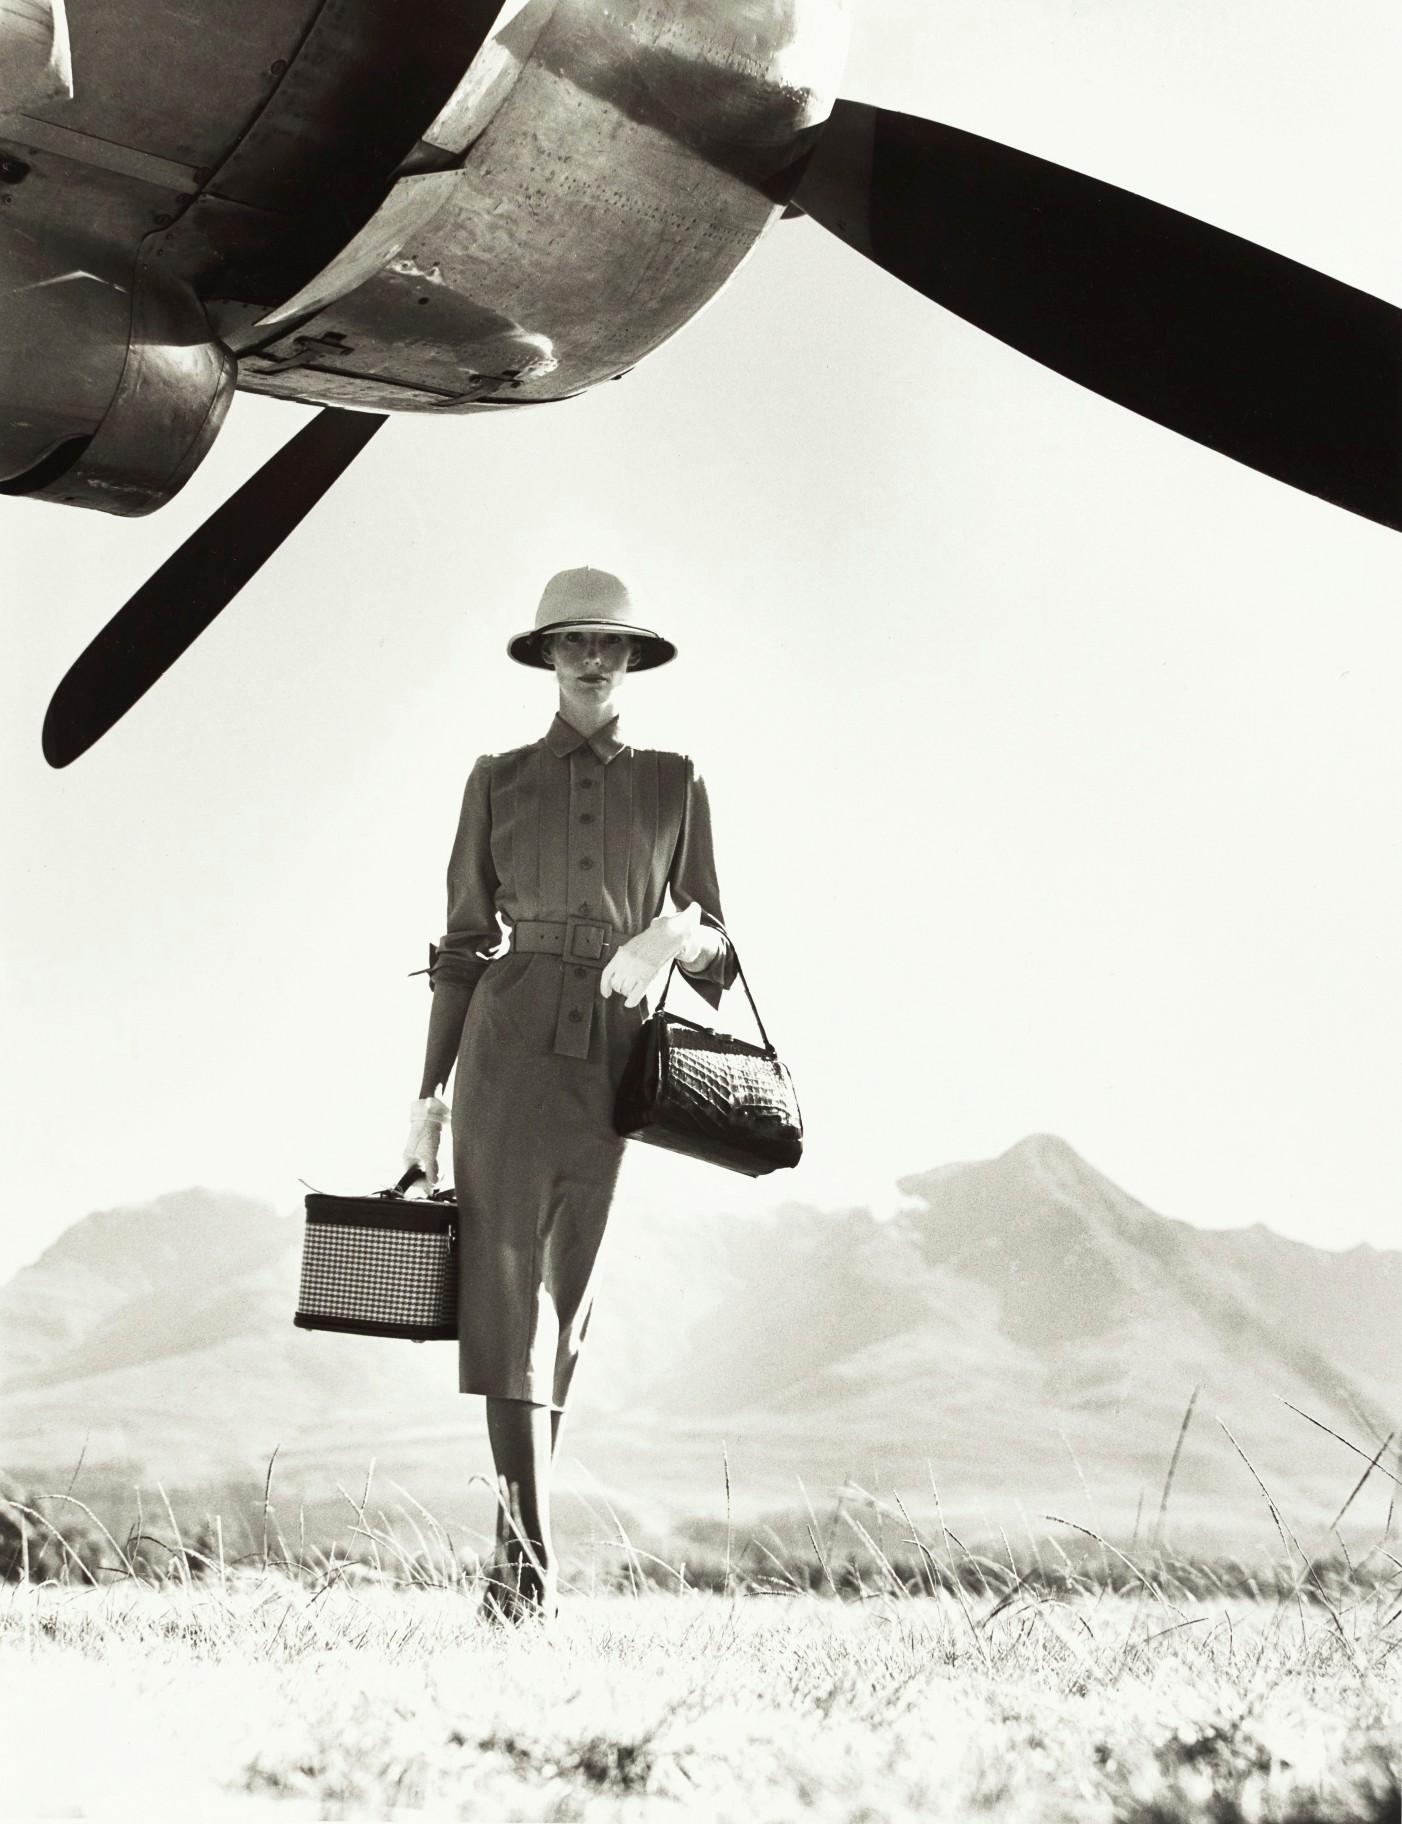 NORMAN PARKINSON | THE ART OF TRAVEL, 1951